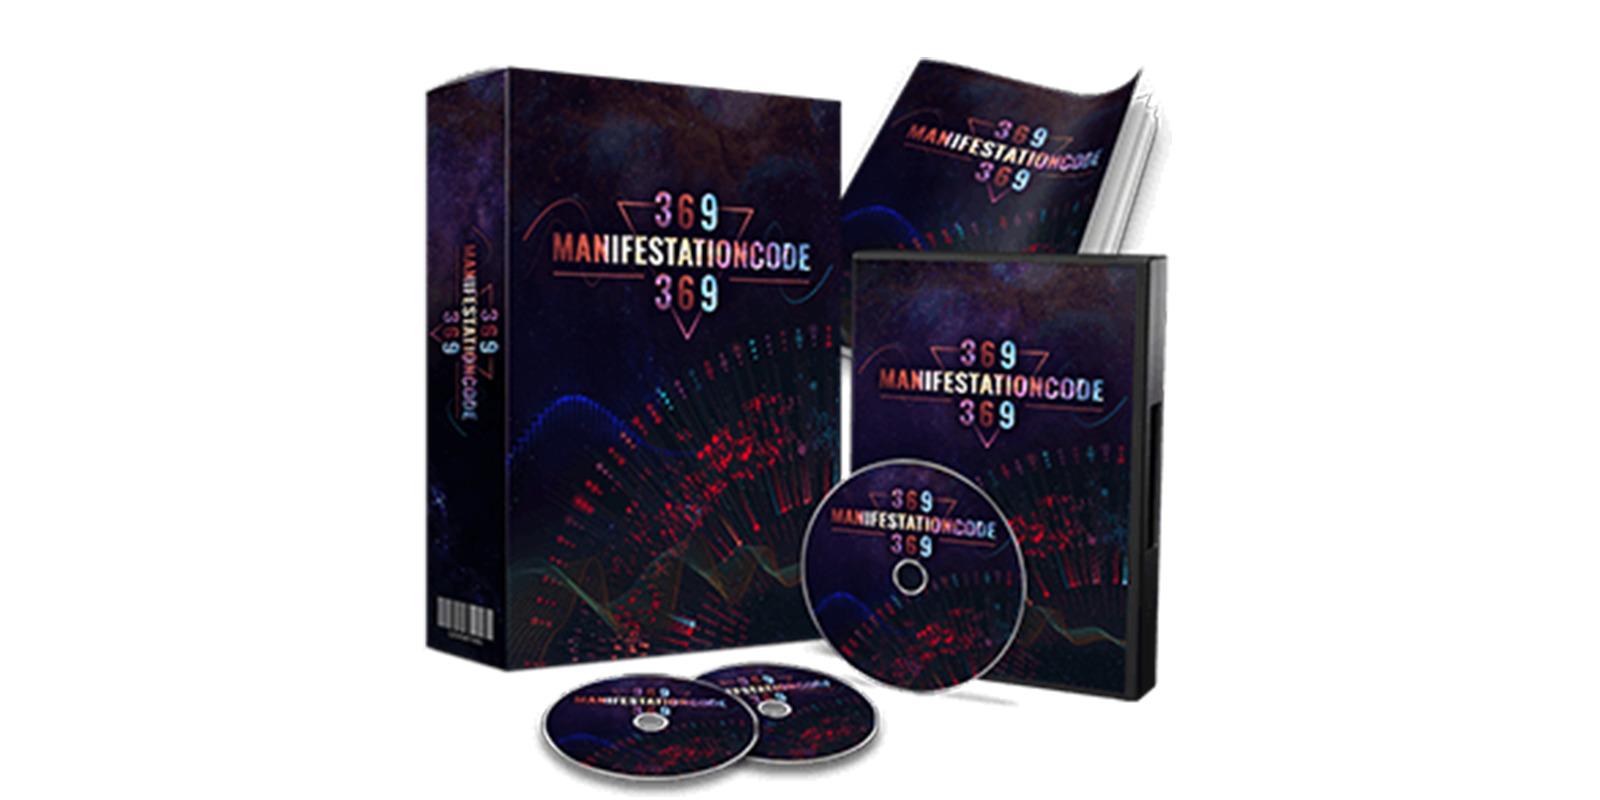 369 Manifestation Code Reviews